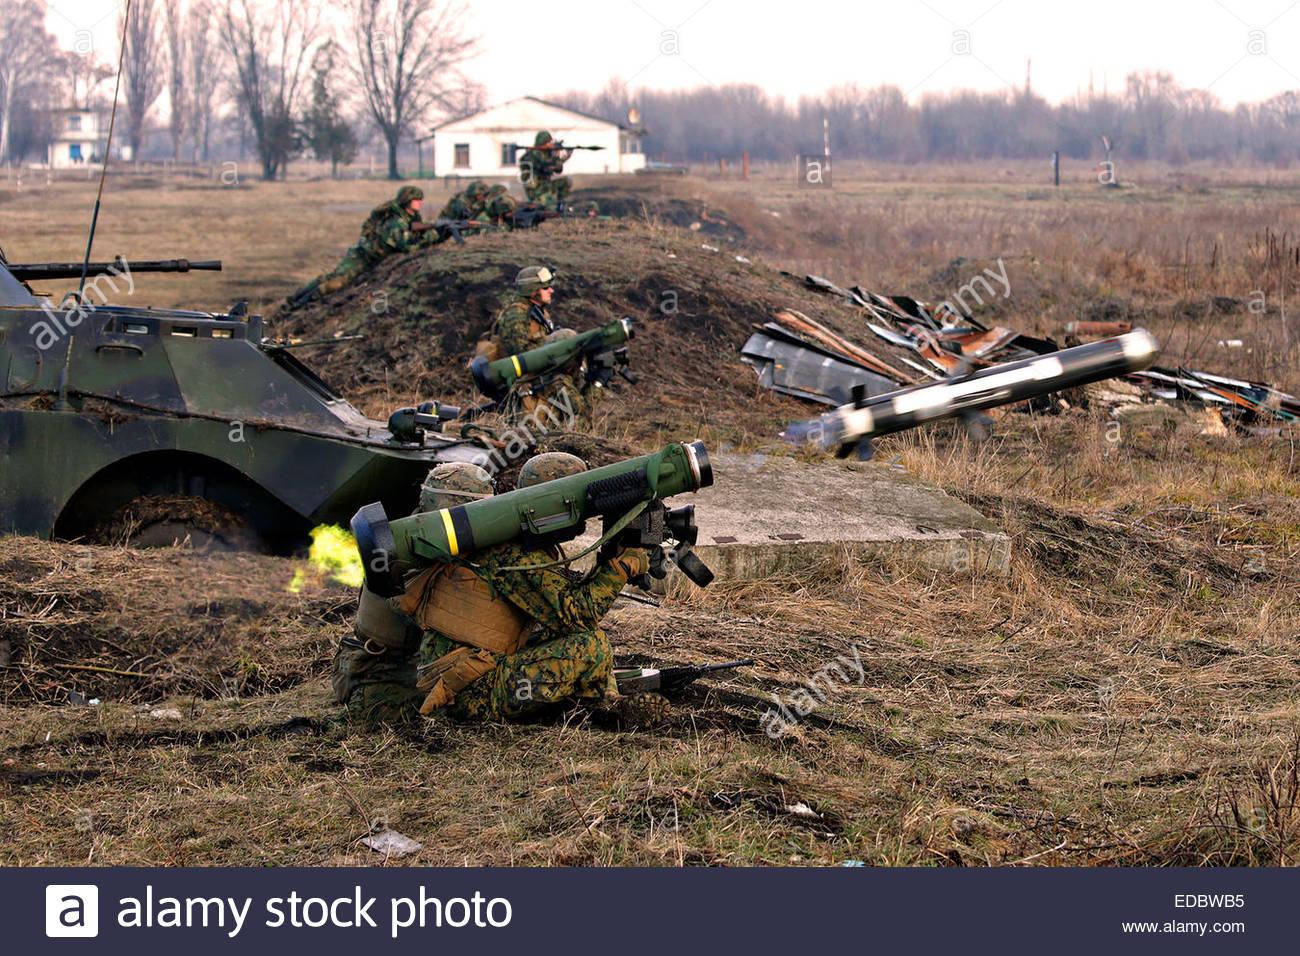 American Soldier Bazooka Stock Photos & American Soldier Bazooka.